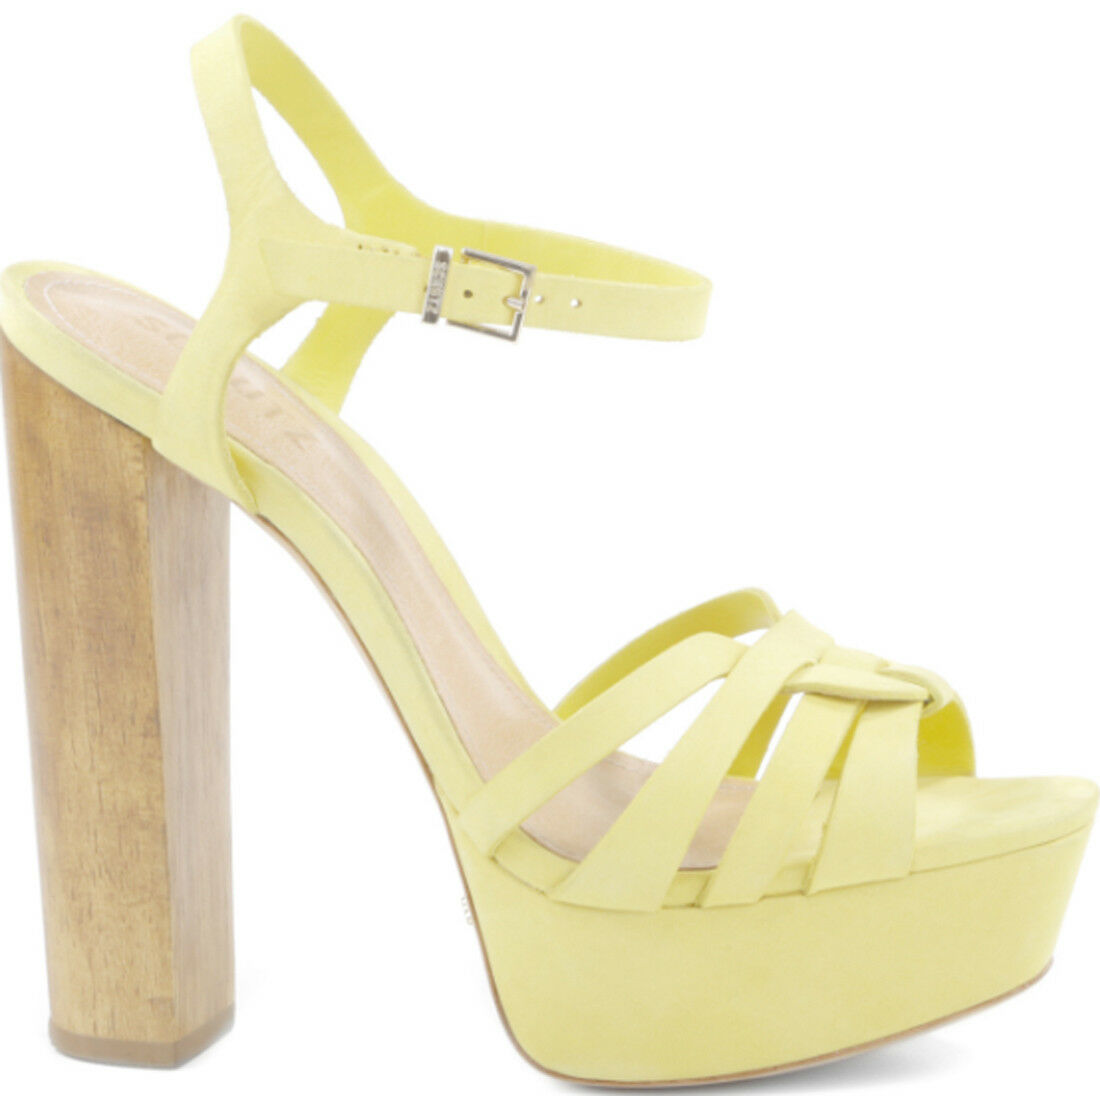 Schutz Wouomo giallo Mannu High Heel Platform Ankle Strap Sandal Pumps